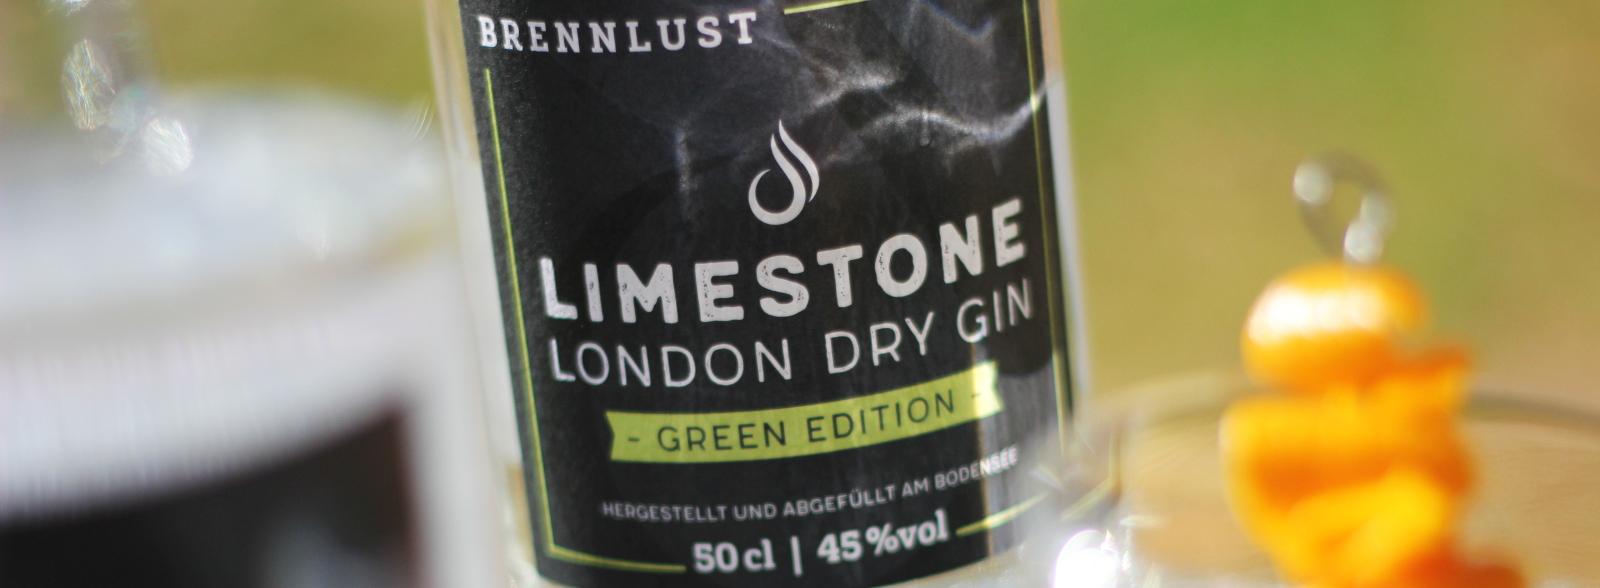 Brennlust Limestone London Dry Gin Green Edition